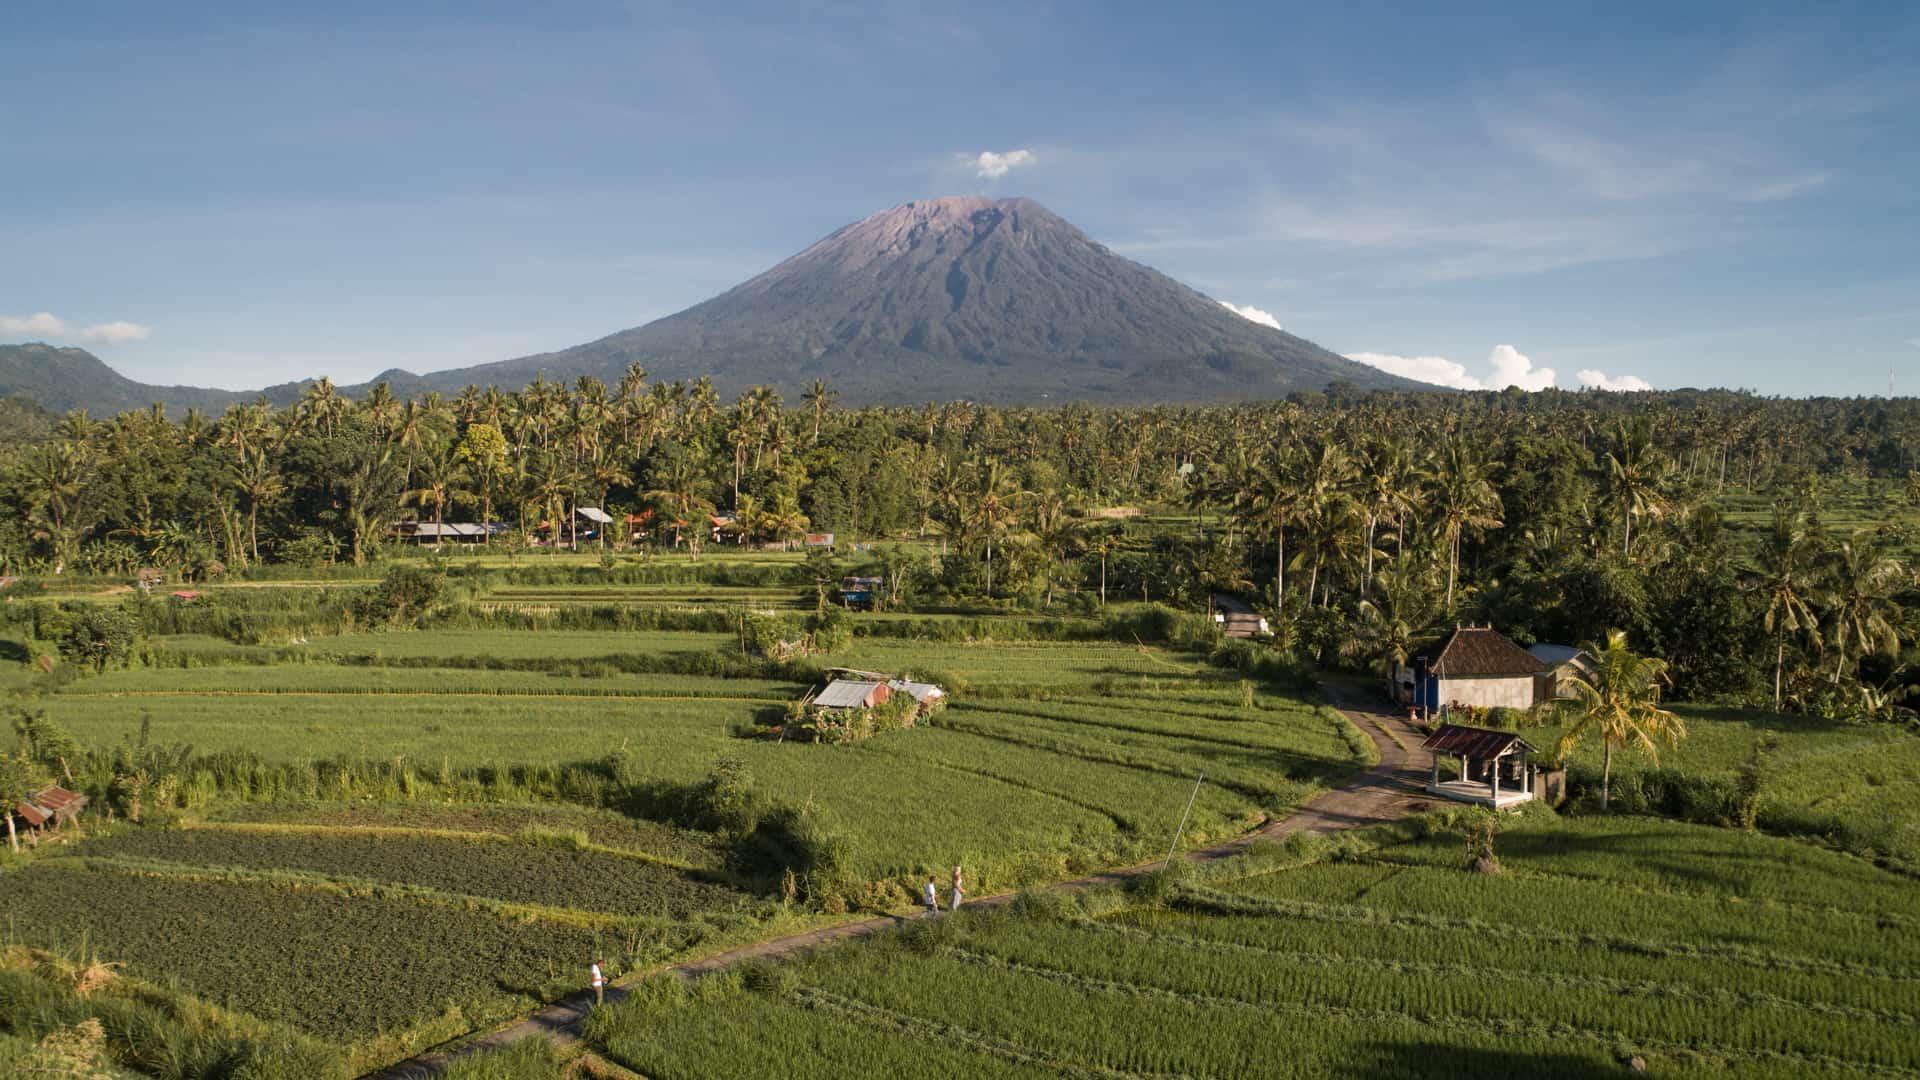 bali-agung-volcano-view